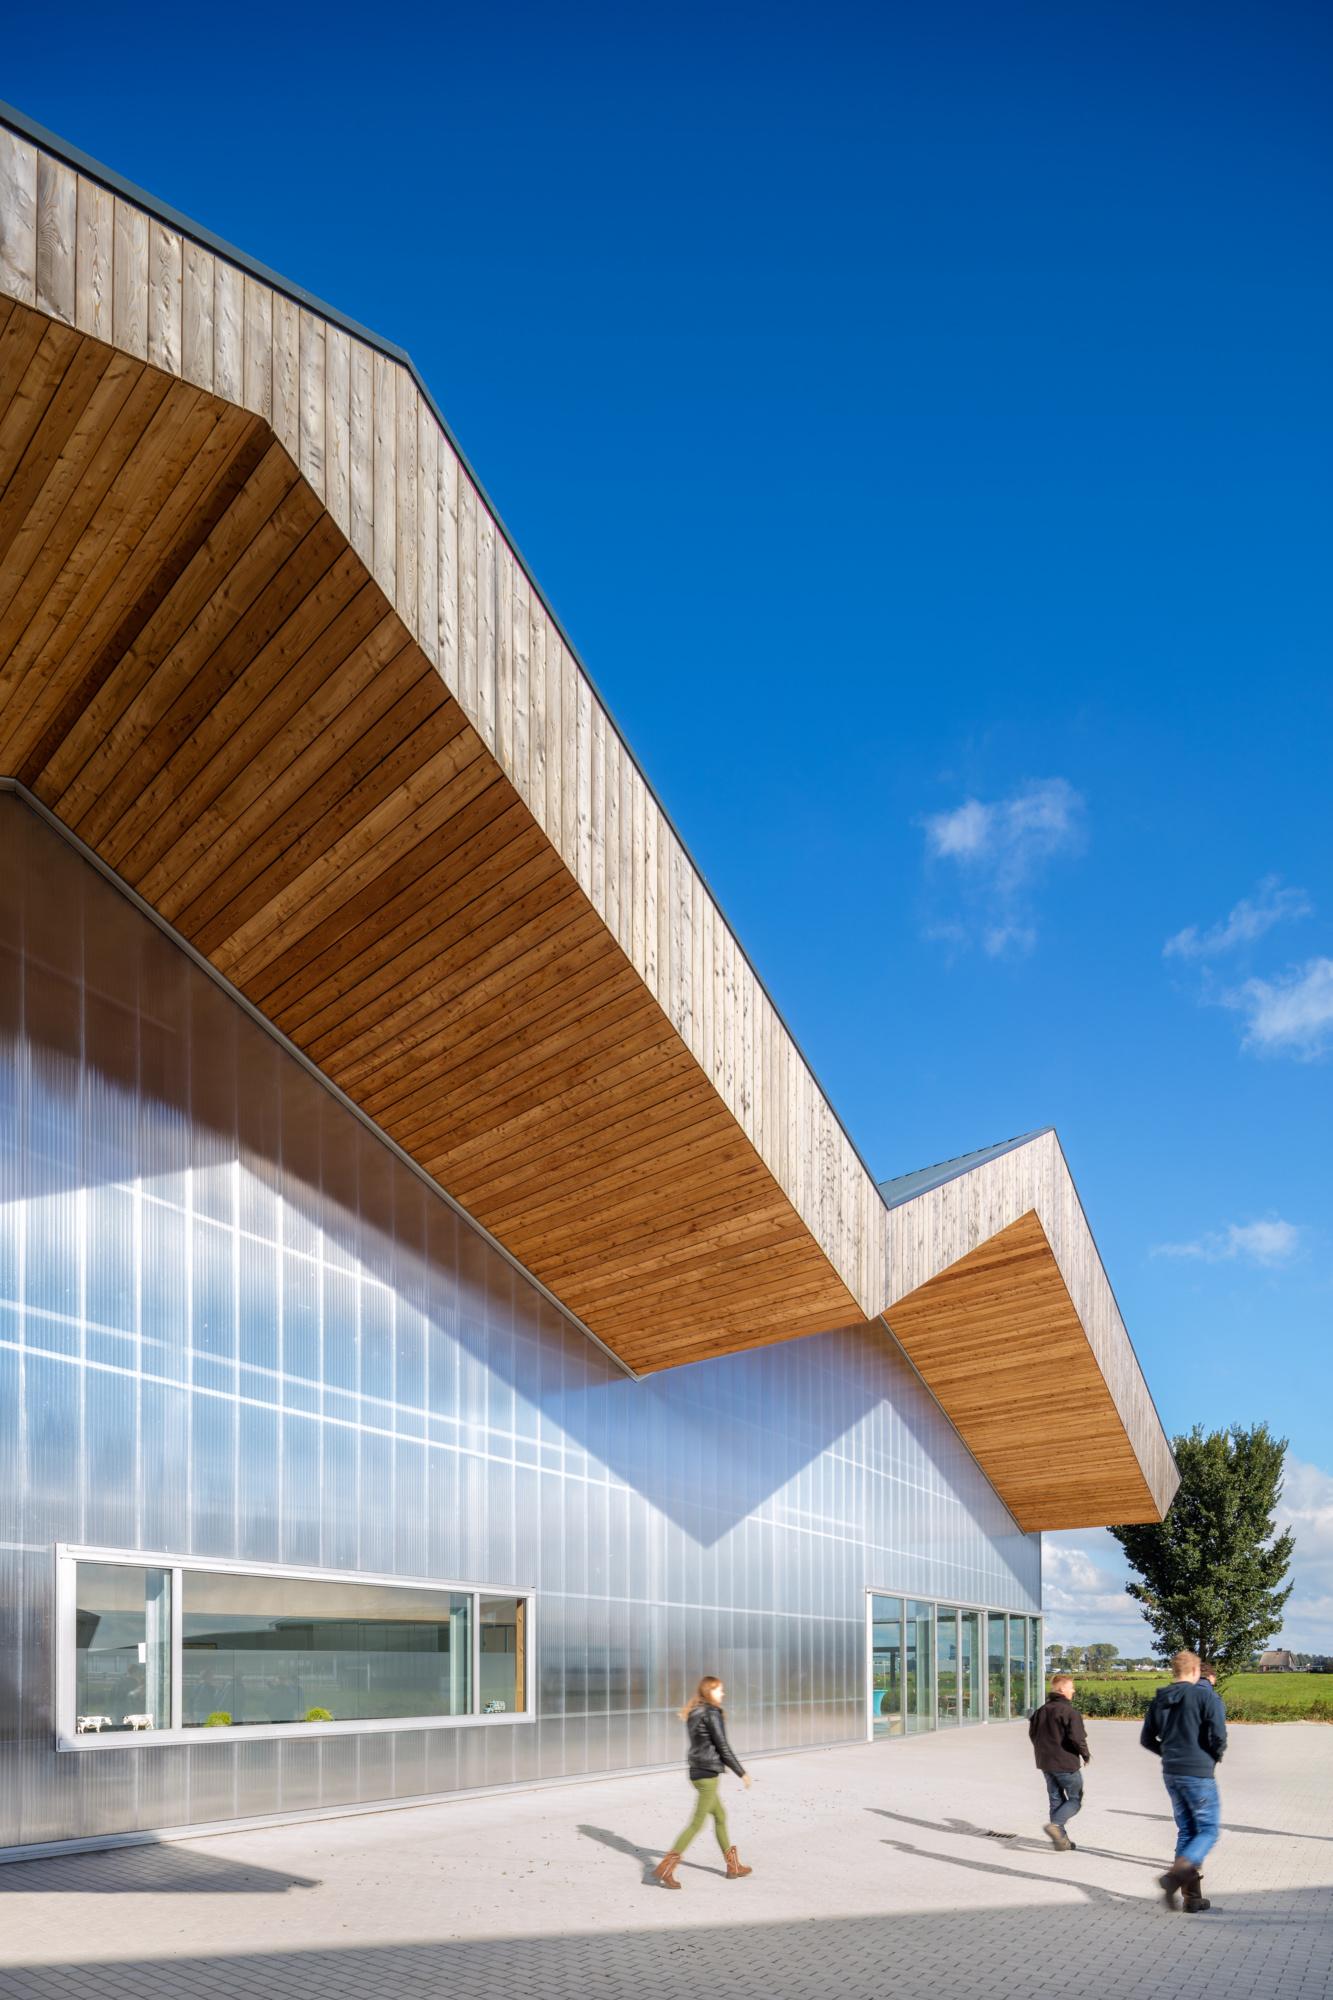 Dairy Campus, Leeuwarden - Arcadis, door Chiel de Nooyer architectuur fotograaf